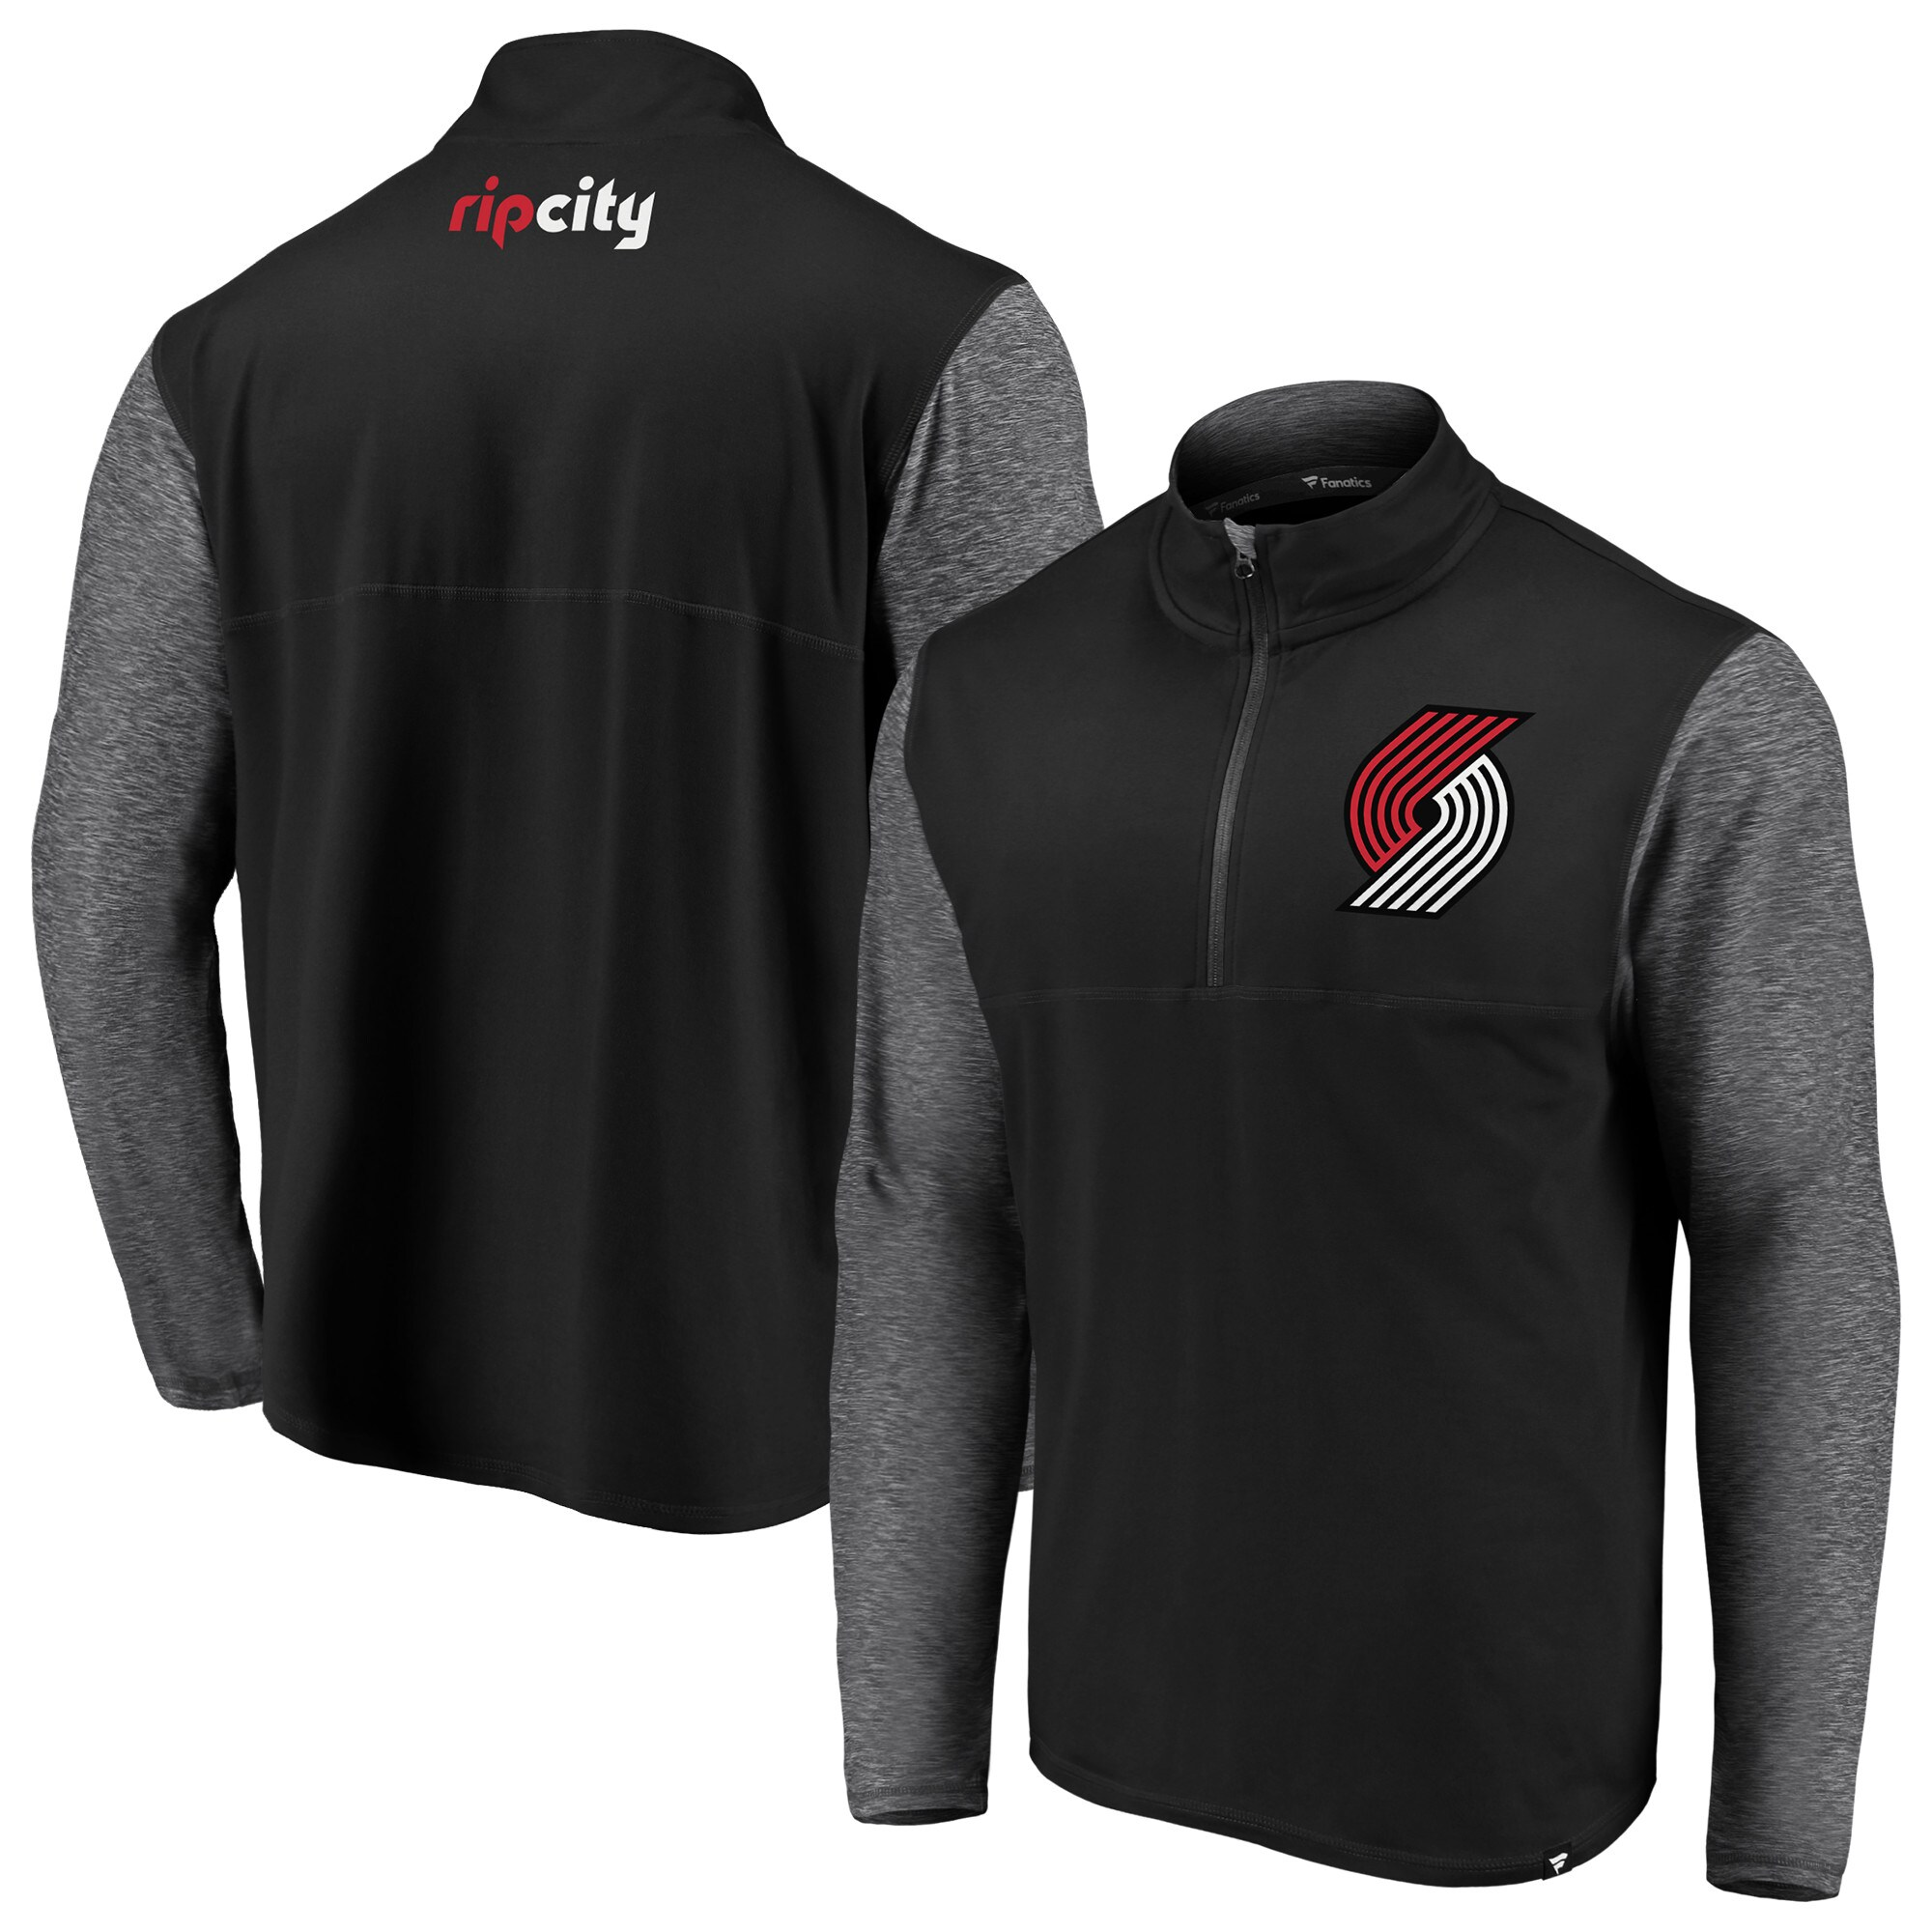 Portland Trail Blazers Fanatics Branded Made to Move Static Performance Quarter-Zip Pullover Jacket - Black/Heathered Black